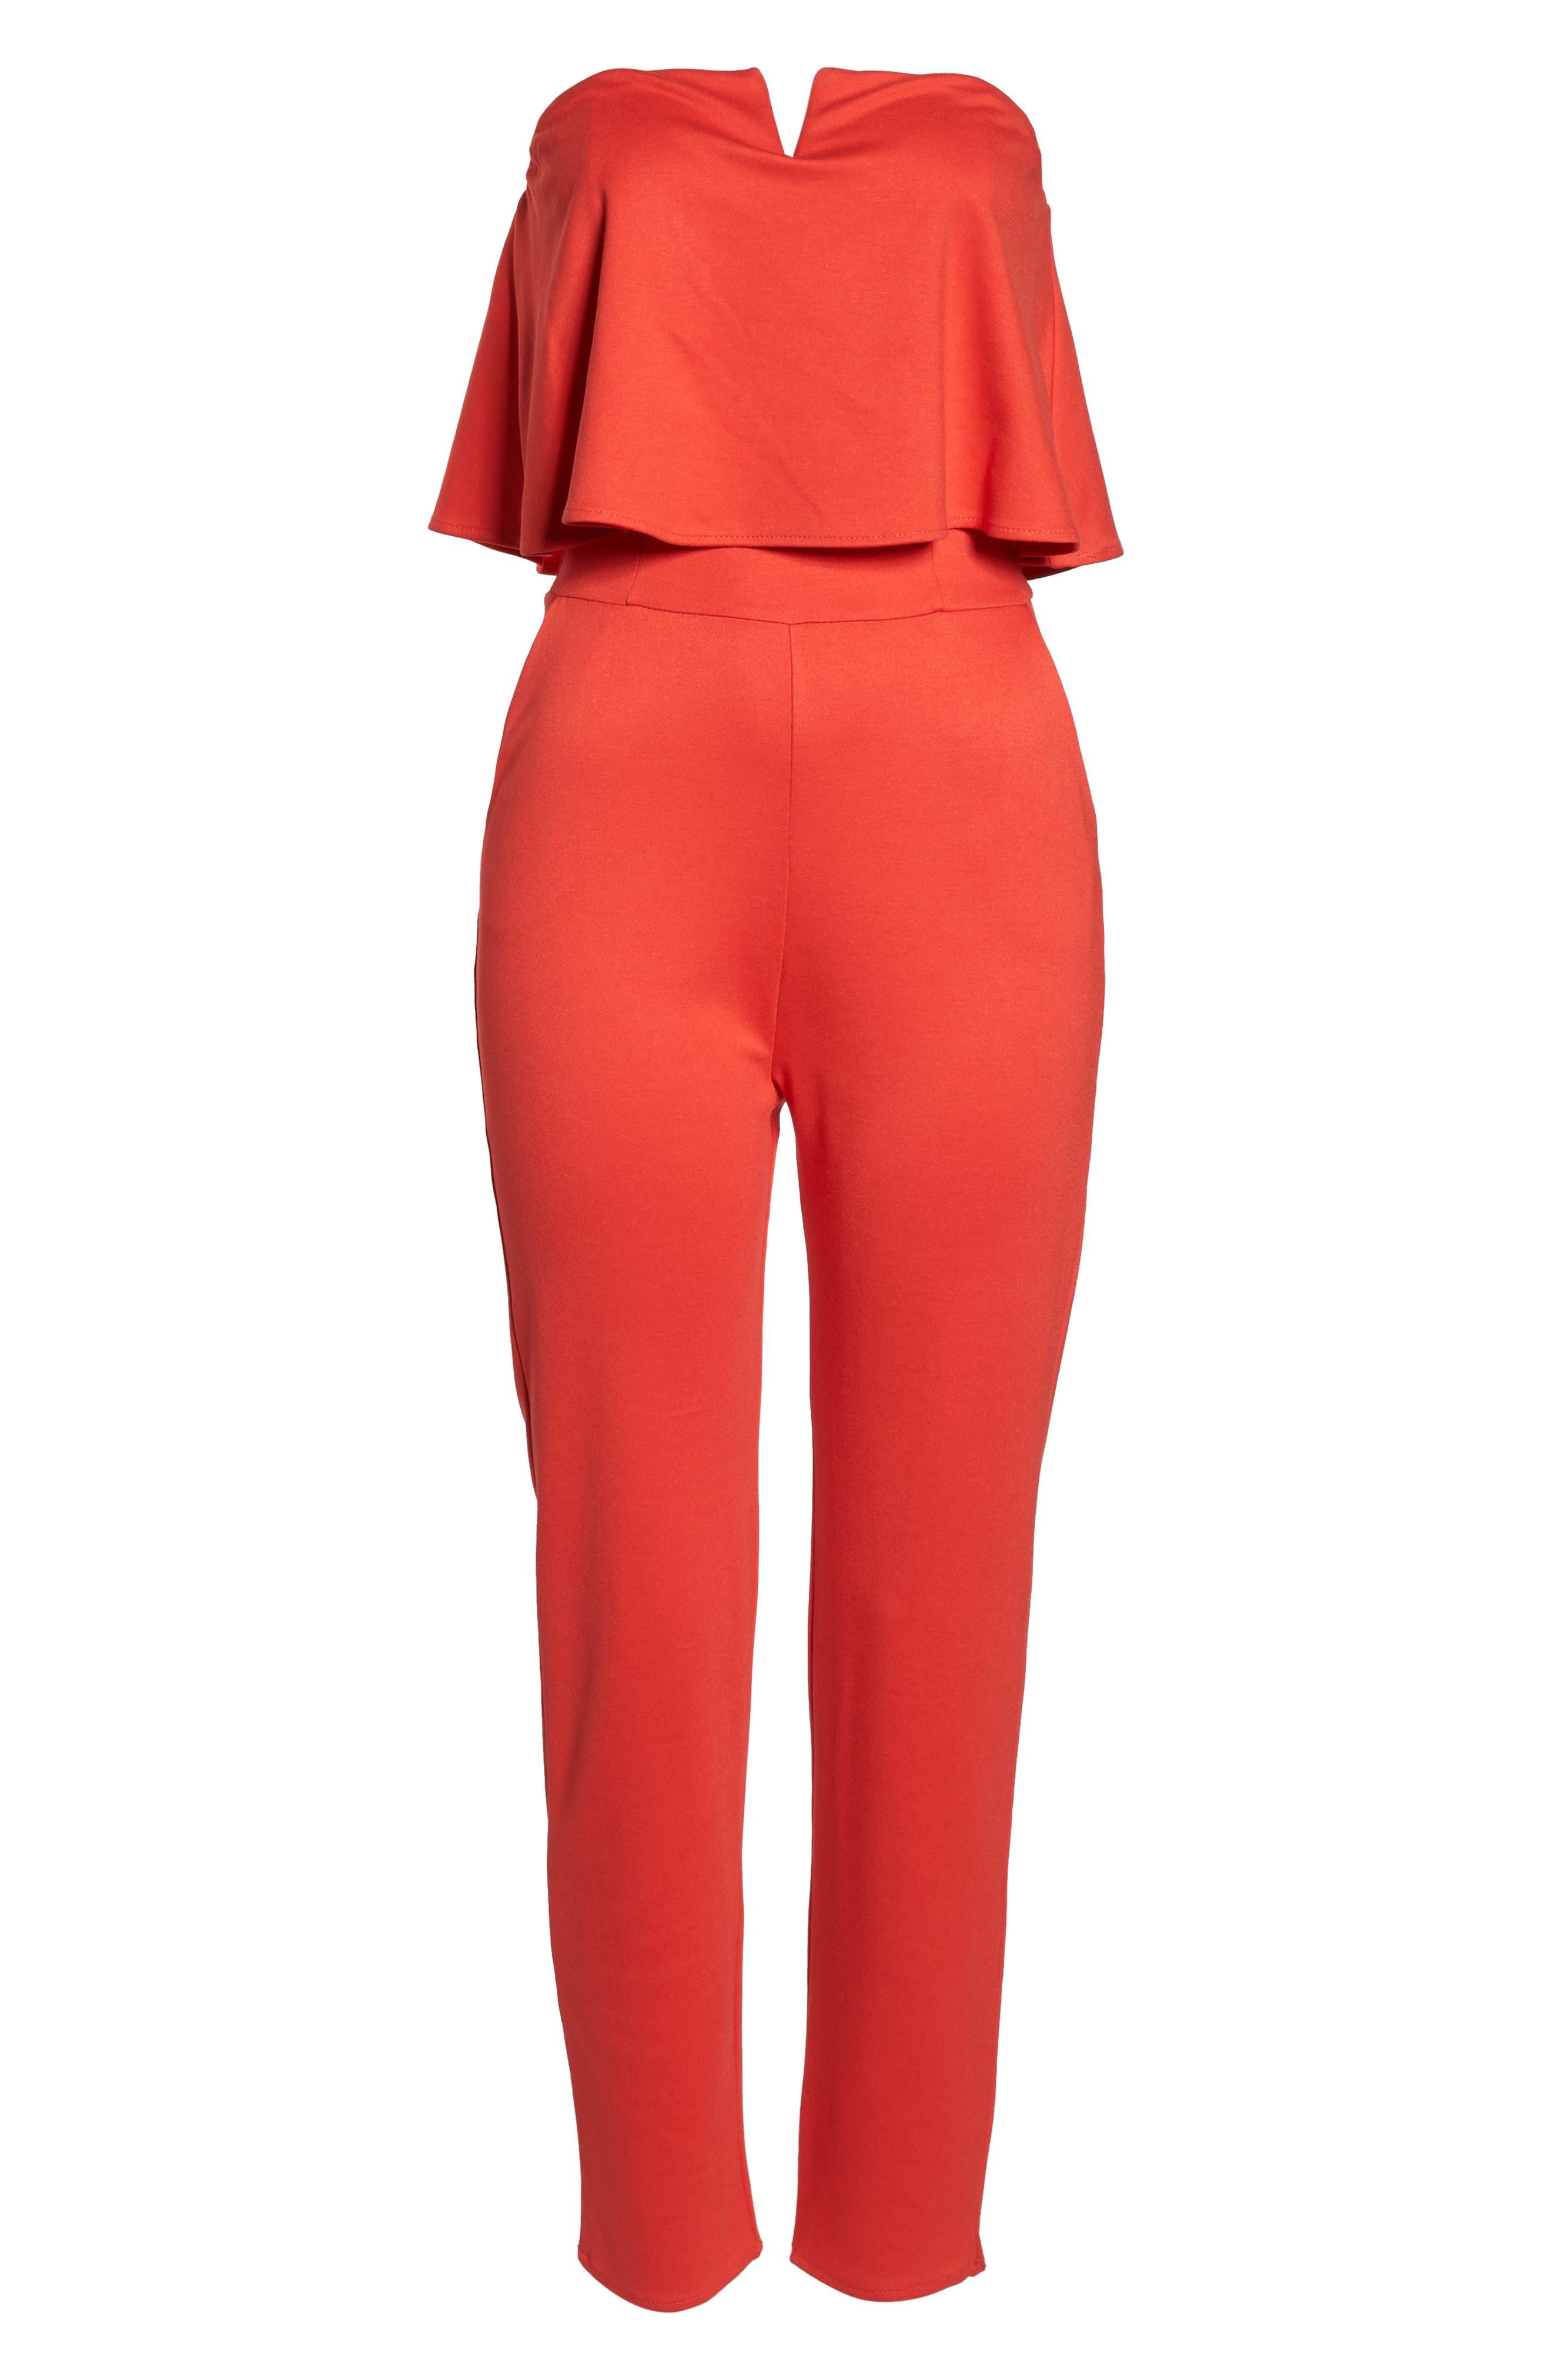 ec178eab4b2 Women s Rompers   Jumpsuits Sale